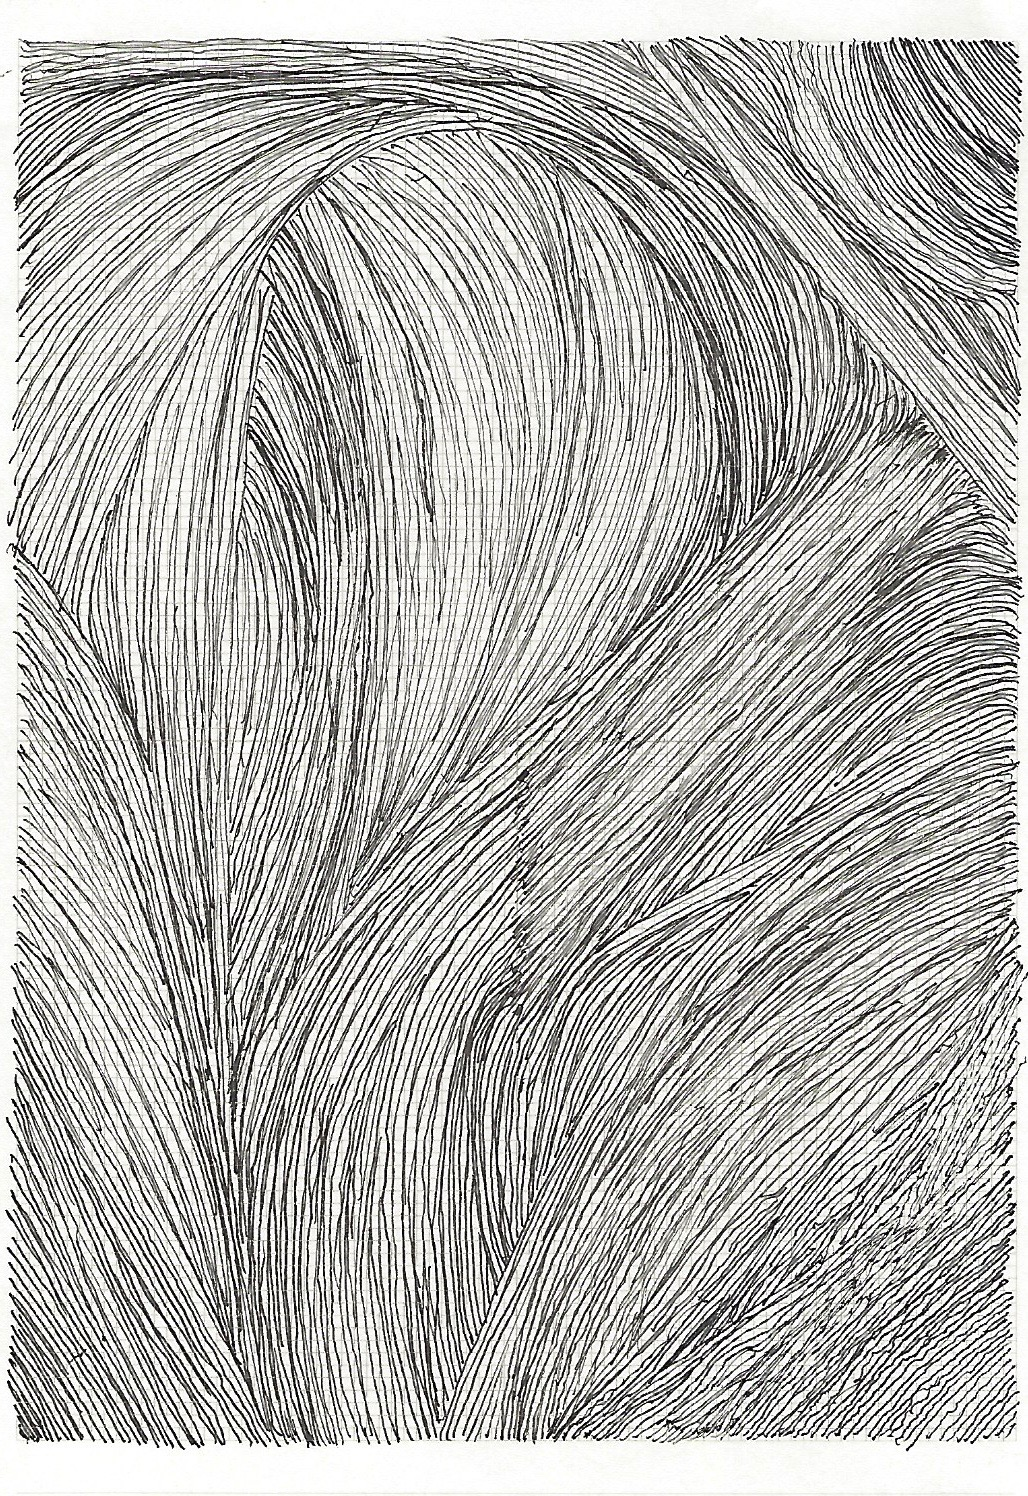 Drawing 12 1.jpg